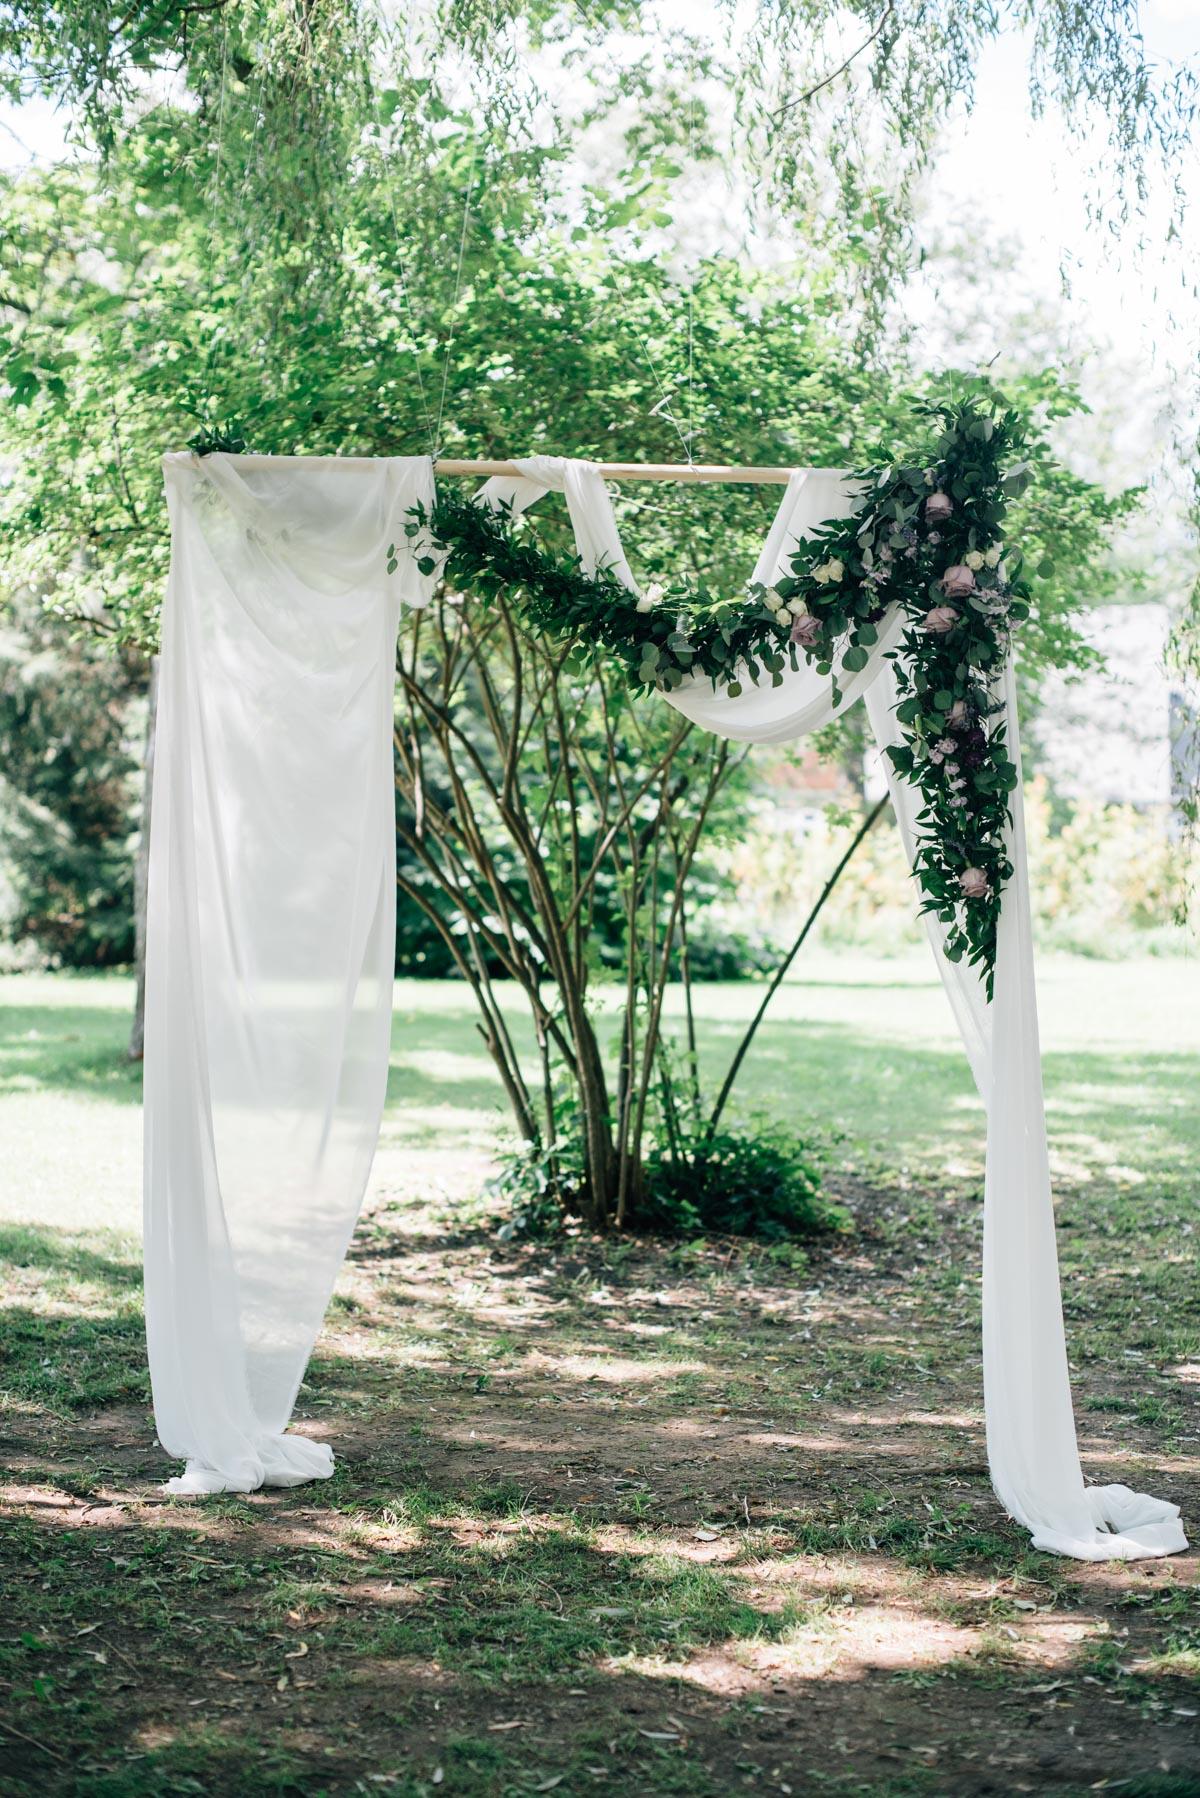 sara-wilde-photography-vineyard-bride-swish-list-beamer-falls-manor-grimsby-wedding-70.jpg